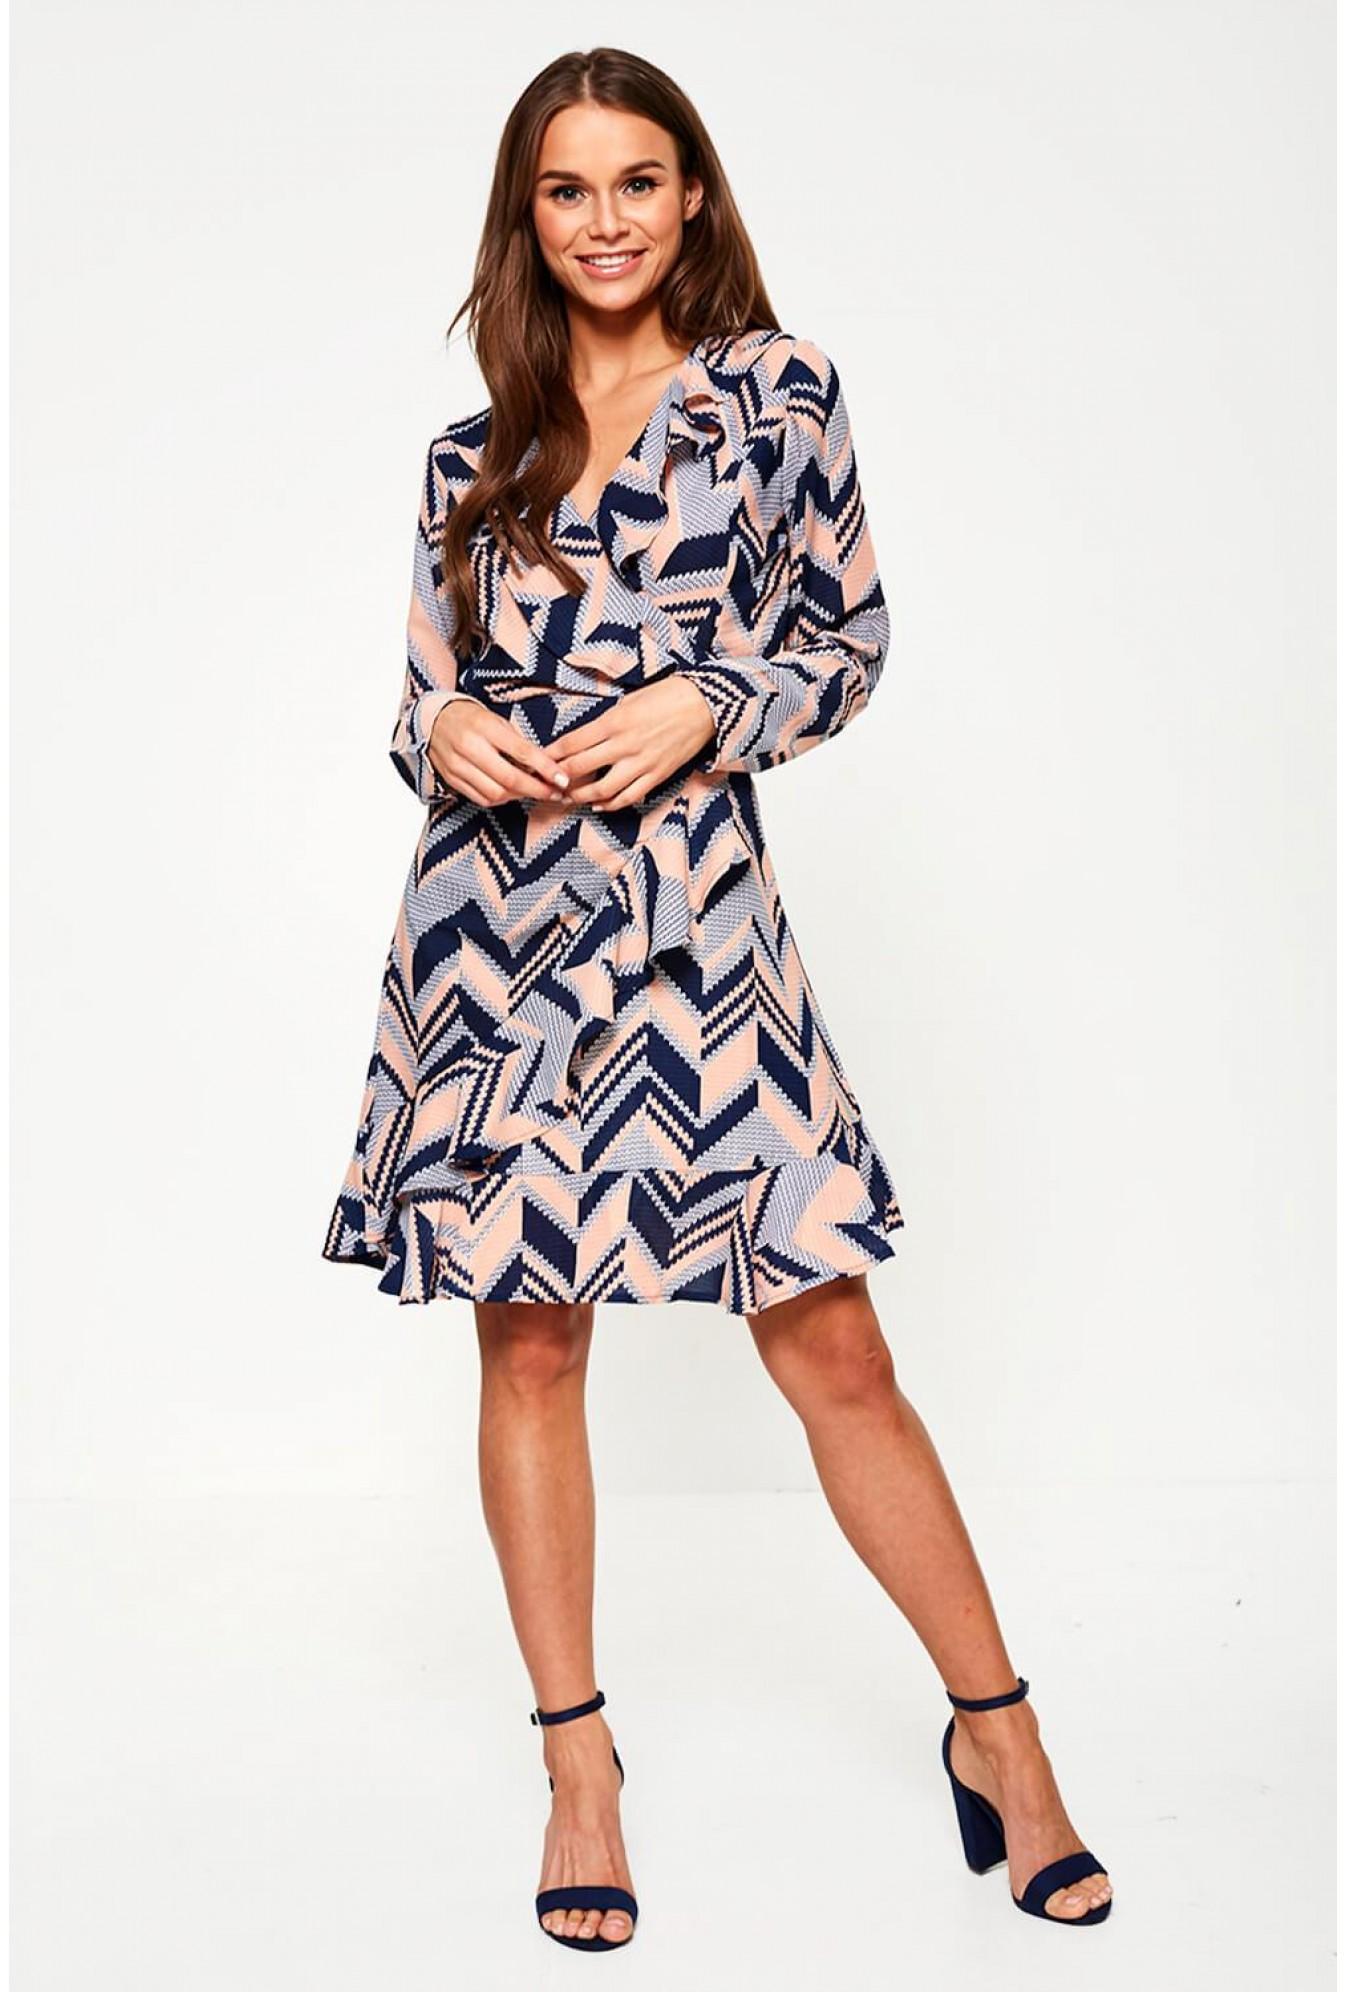 0d4b874f58 Marc Angelo Geometric Print Wrap Dress in Navy   iCLOTHING